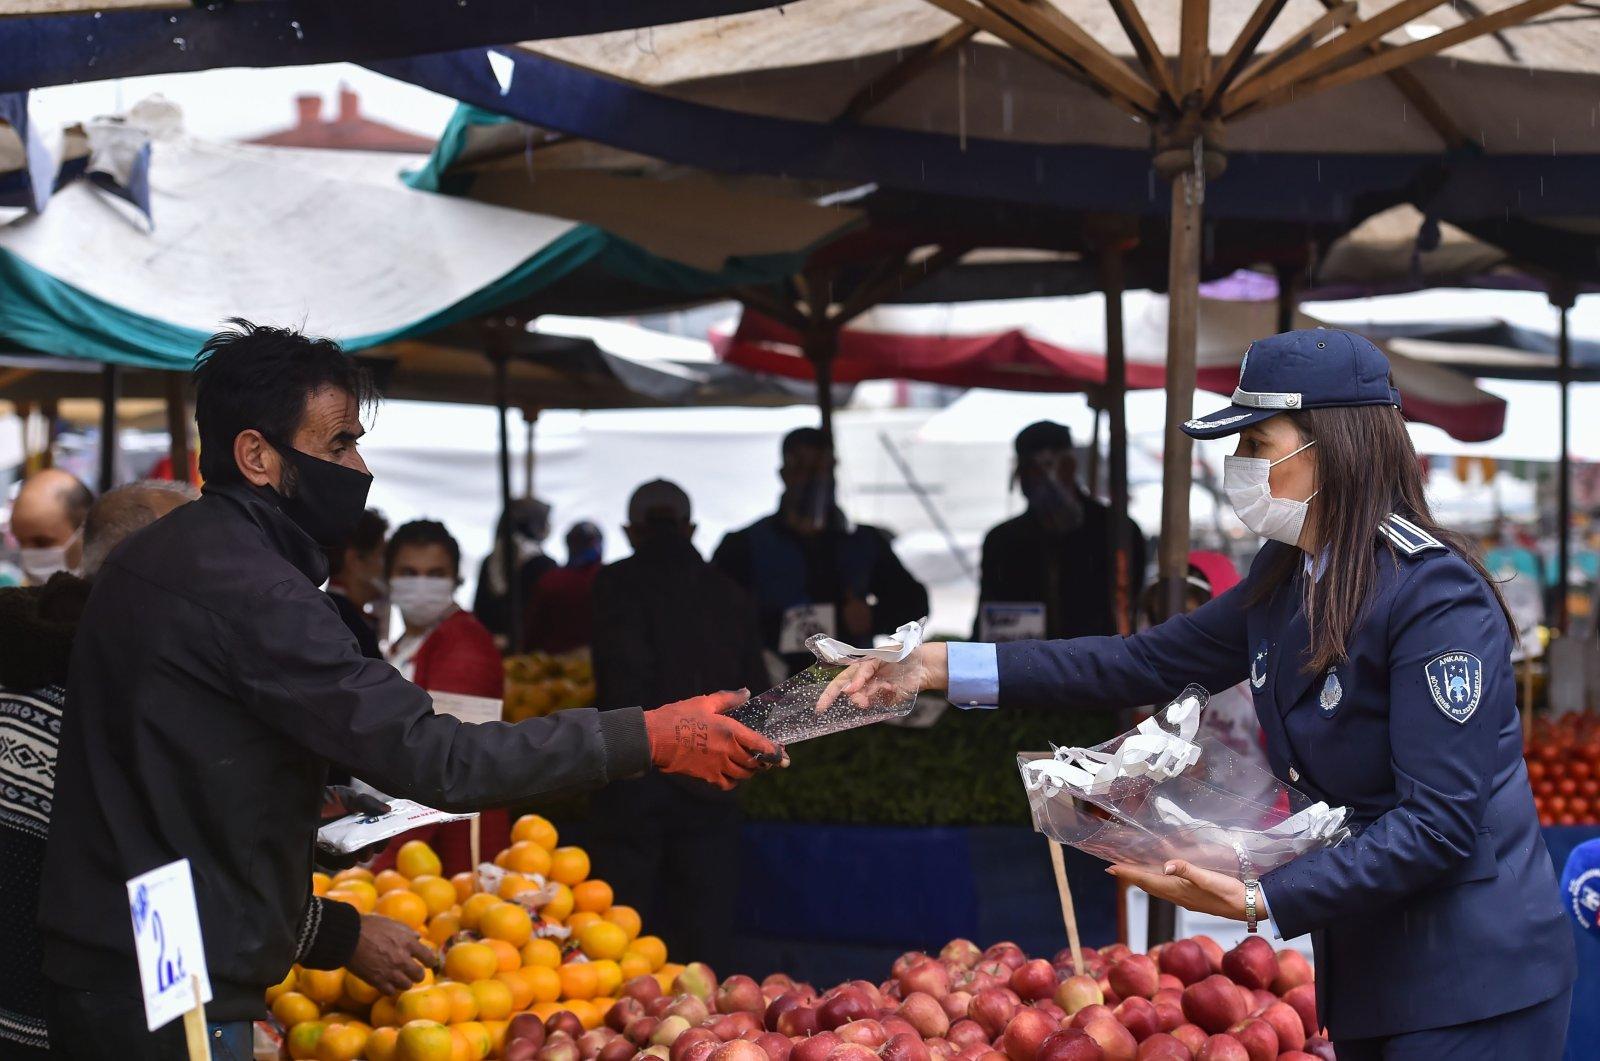 An Ankara municipal police officer hands a face shield to a fruit vendor at a market in the capital Ankara, Turkey, Nov. 3, 2020. (IHA Photo)